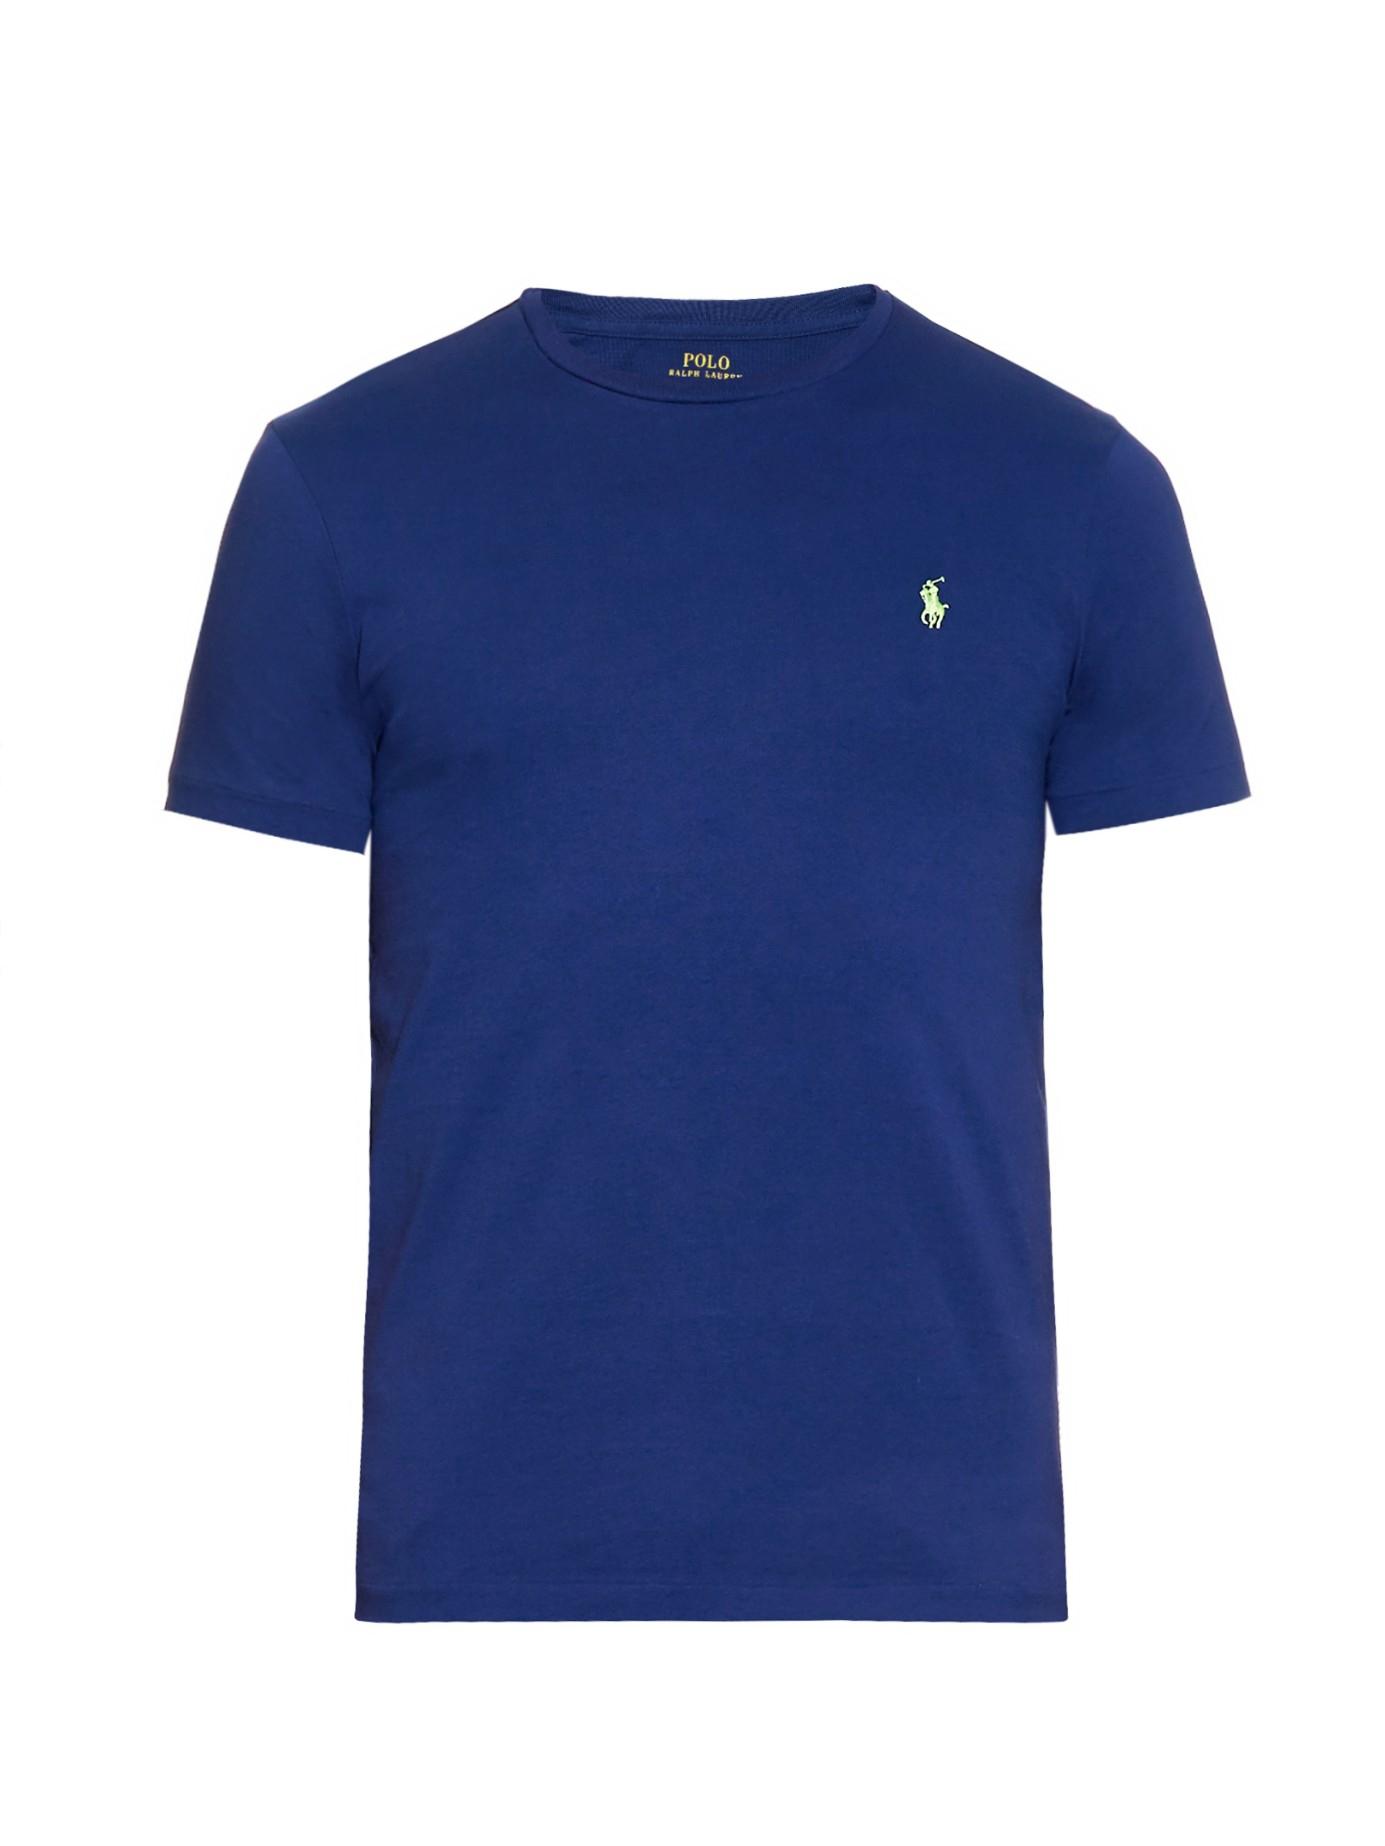 polo ralph lauren crew neck t shirt in blue for men lyst. Black Bedroom Furniture Sets. Home Design Ideas